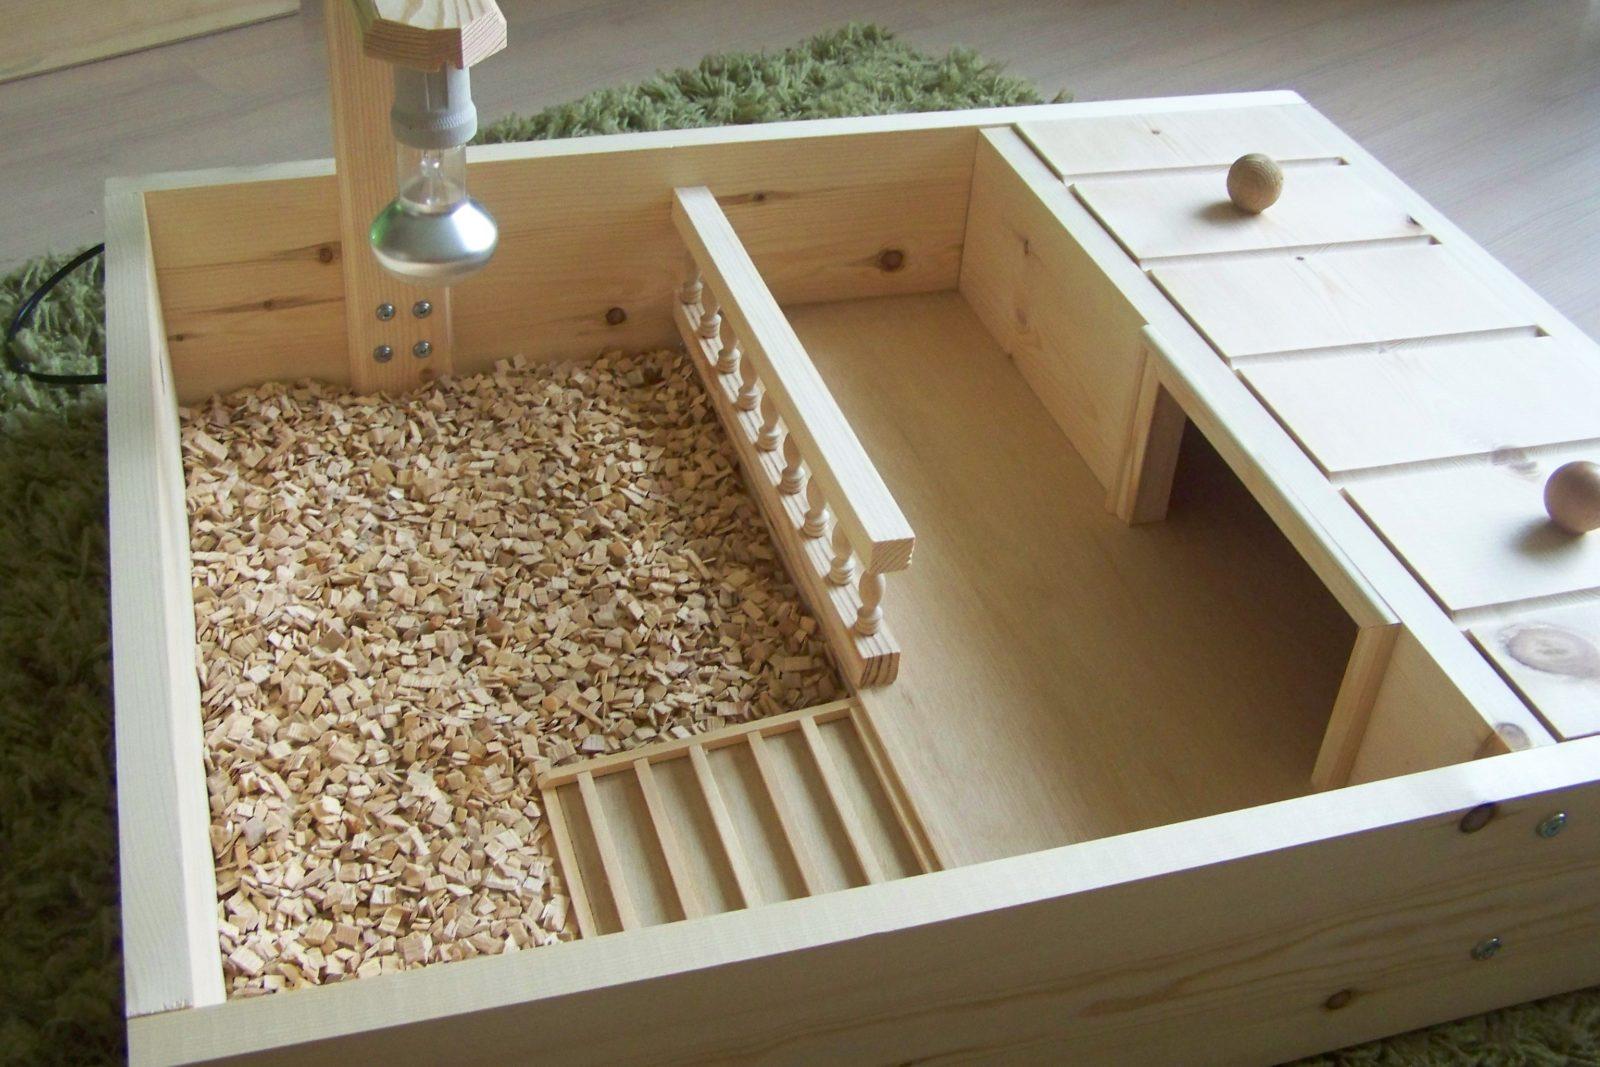 1000 ideas about tortoise enclosure on pinterest tortoise table - Habitats Indoor Tortoises Submited Images